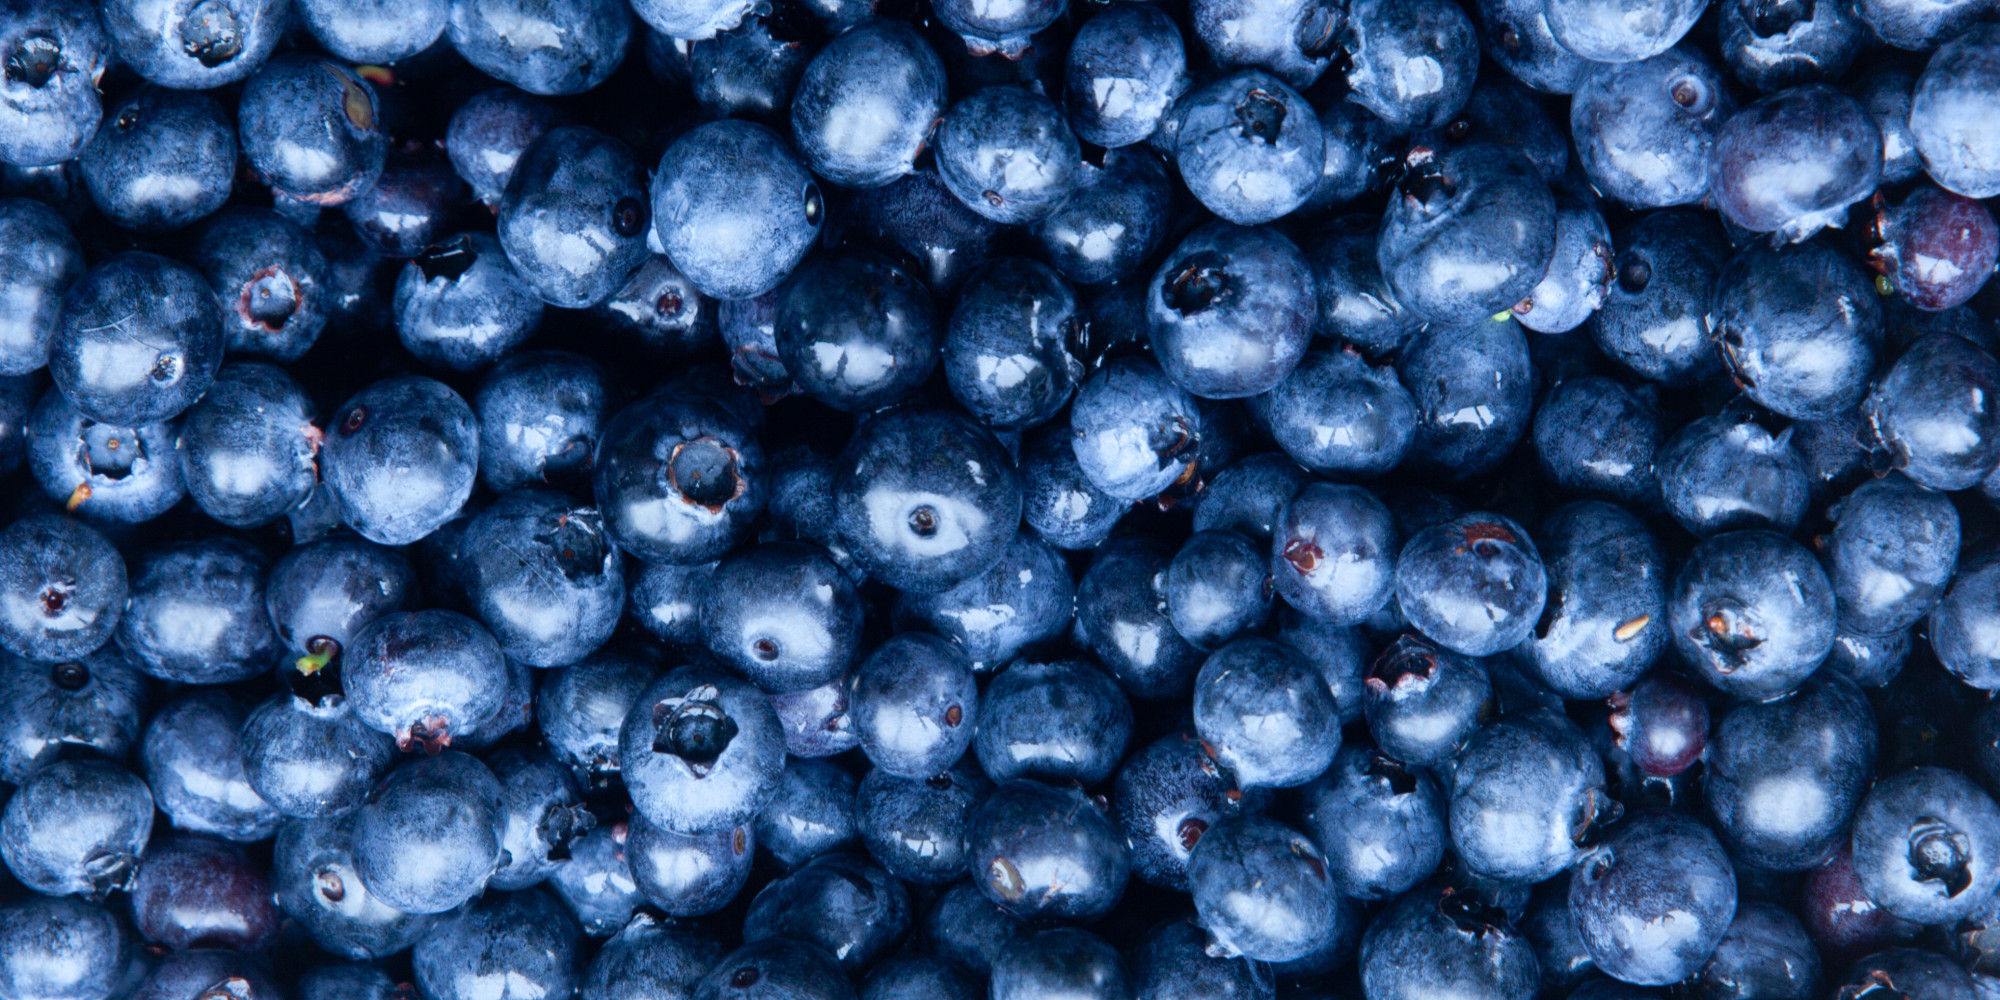 Organic Blueberries -